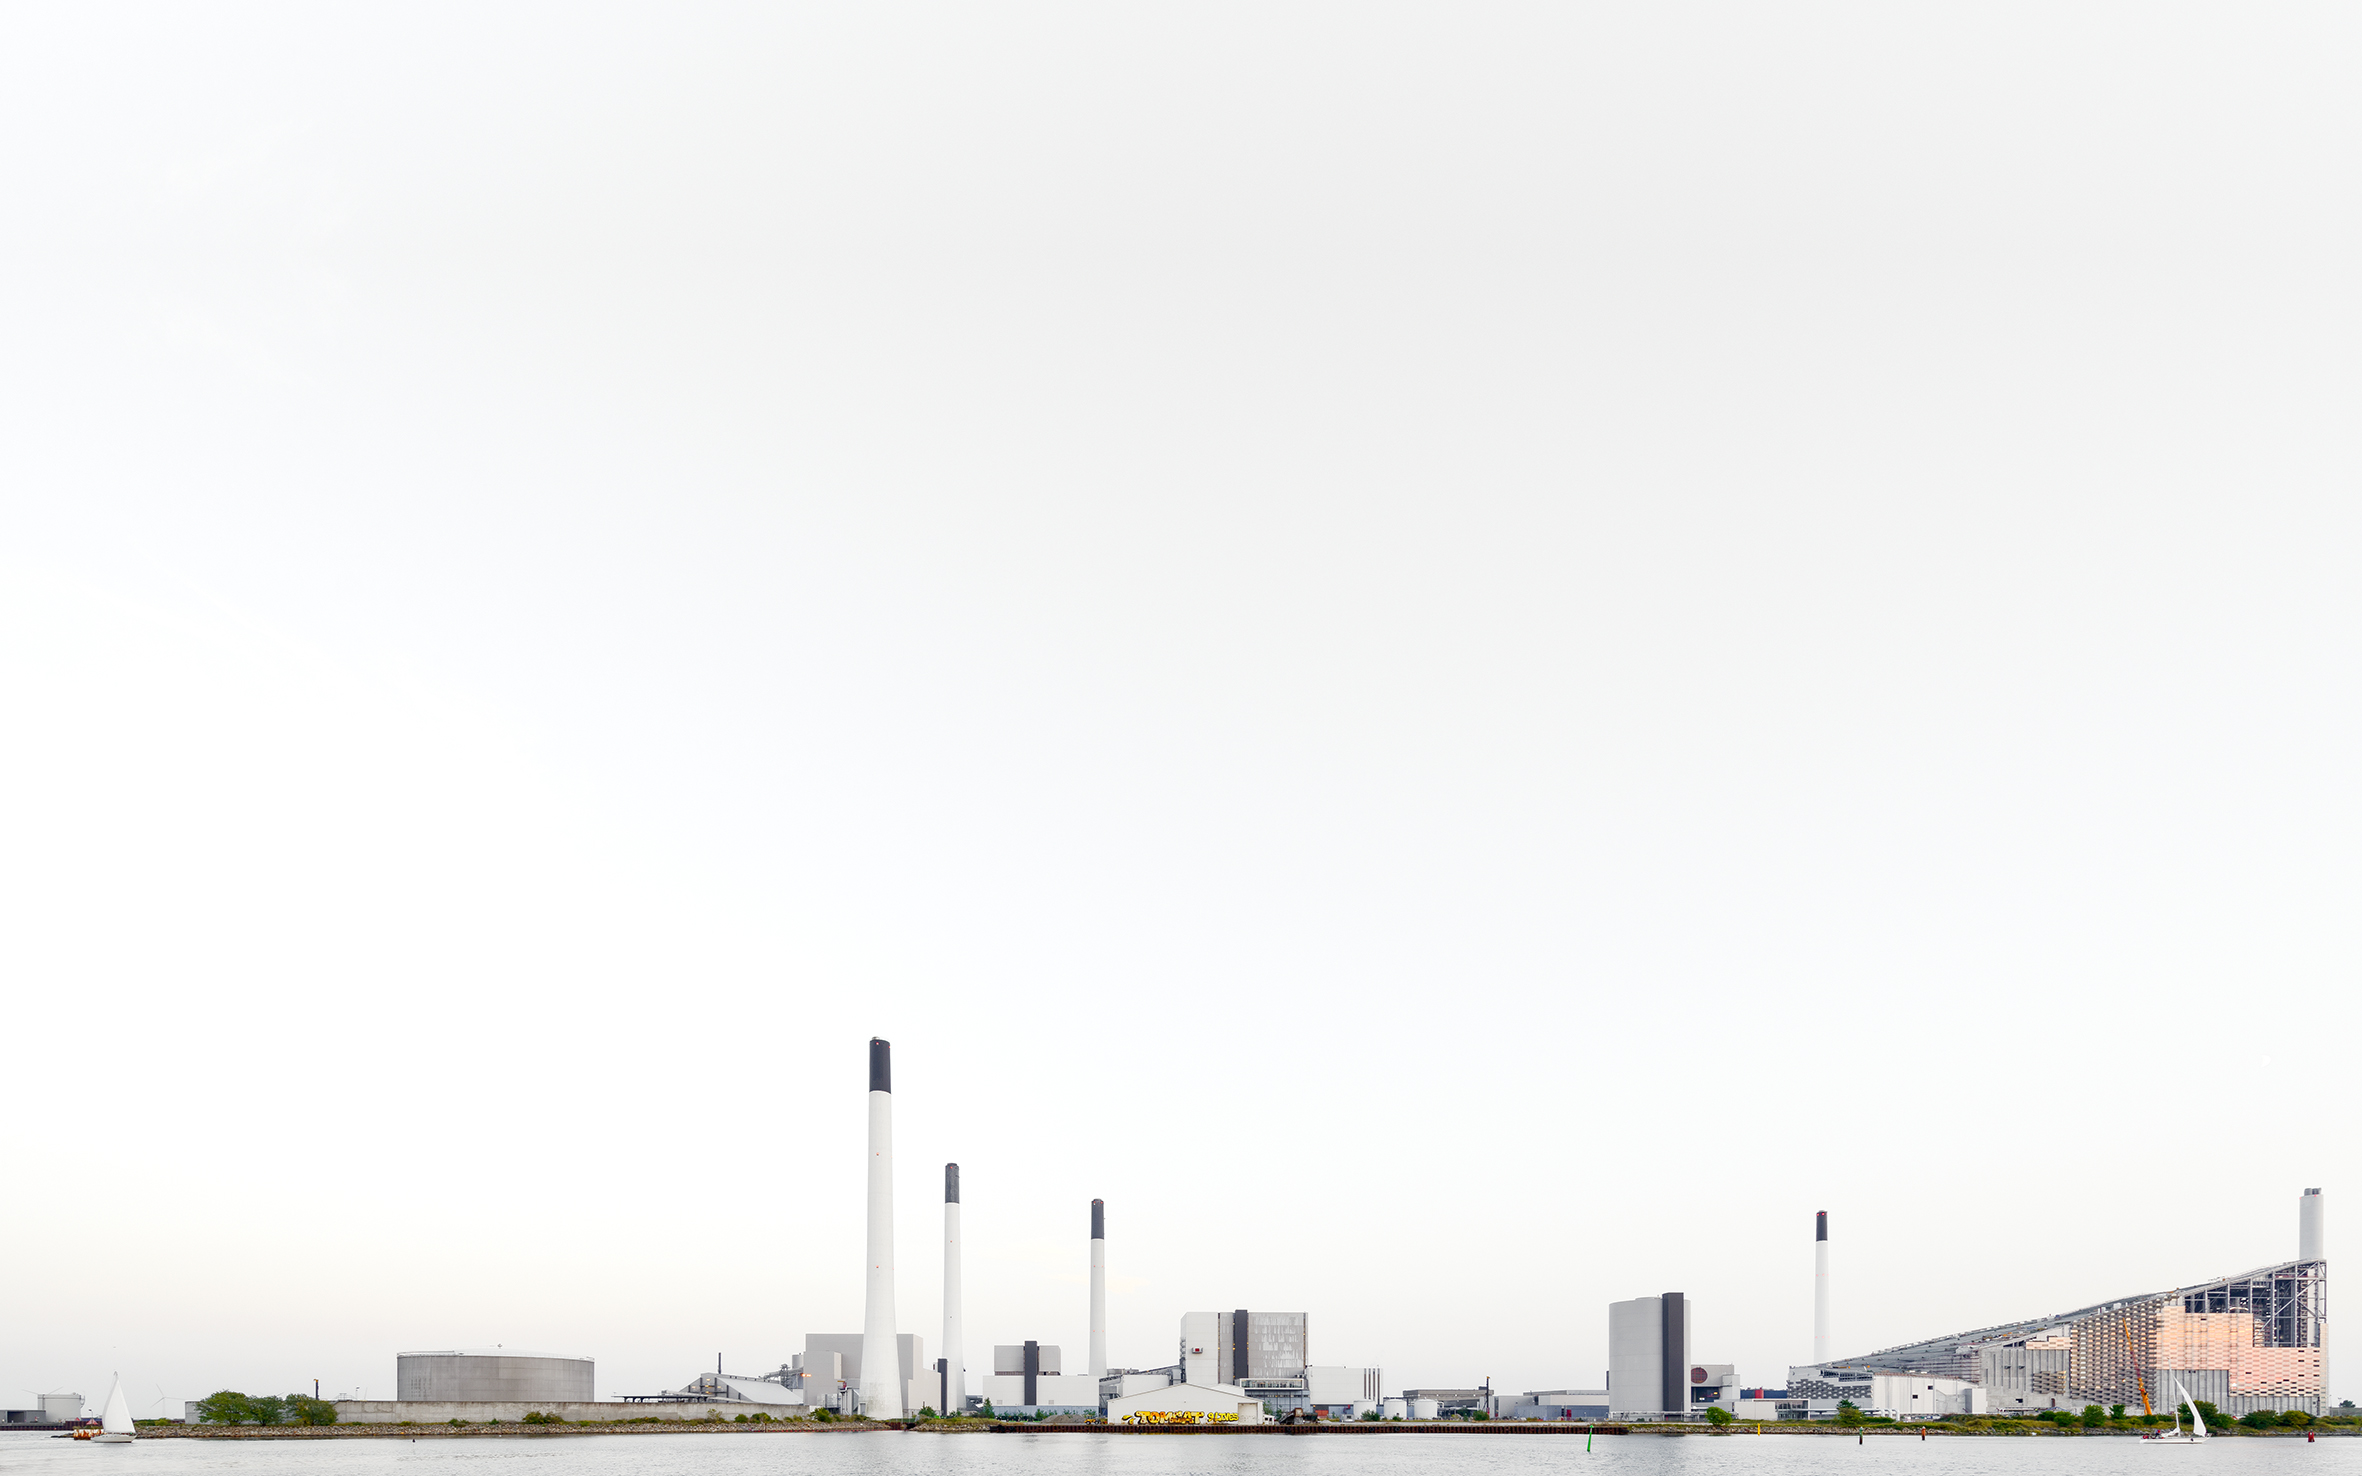 Luca Lupi, Landscape, Copenaghen, 2016, archival pigment print, 20x32 cm